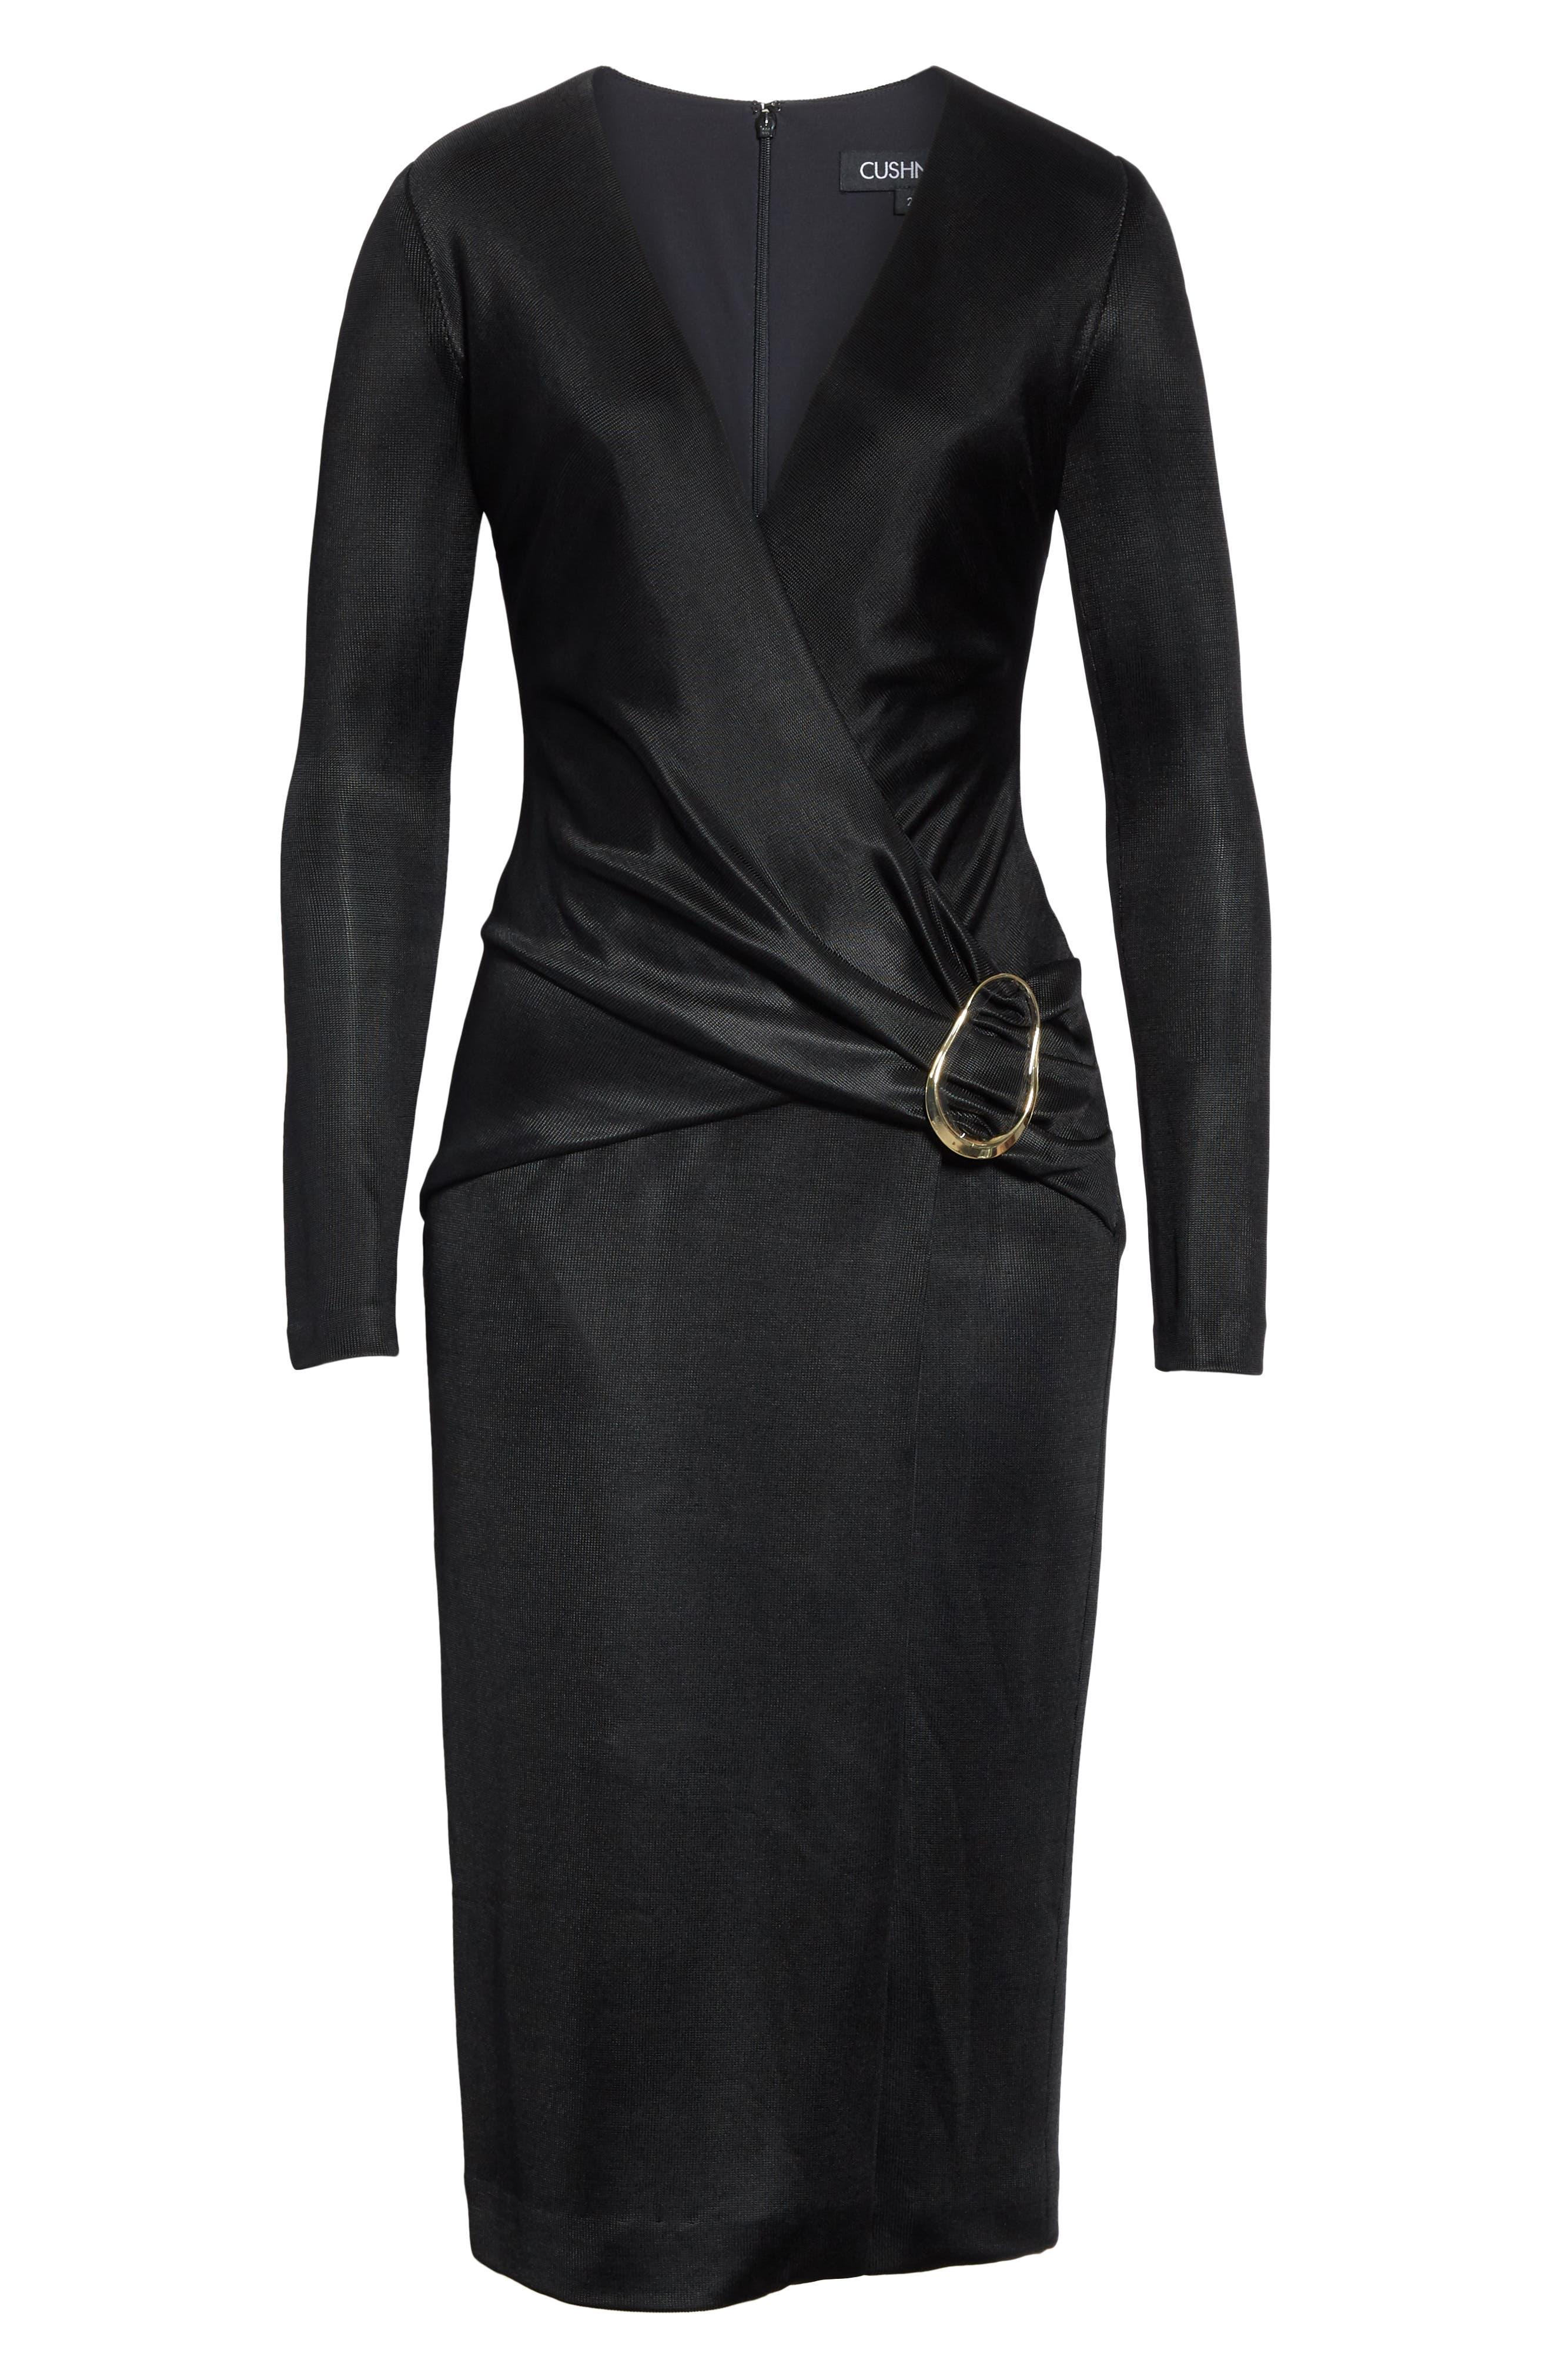 CUSHNIE, Sahara Pencil Dress, Alternate thumbnail 7, color, BLACK